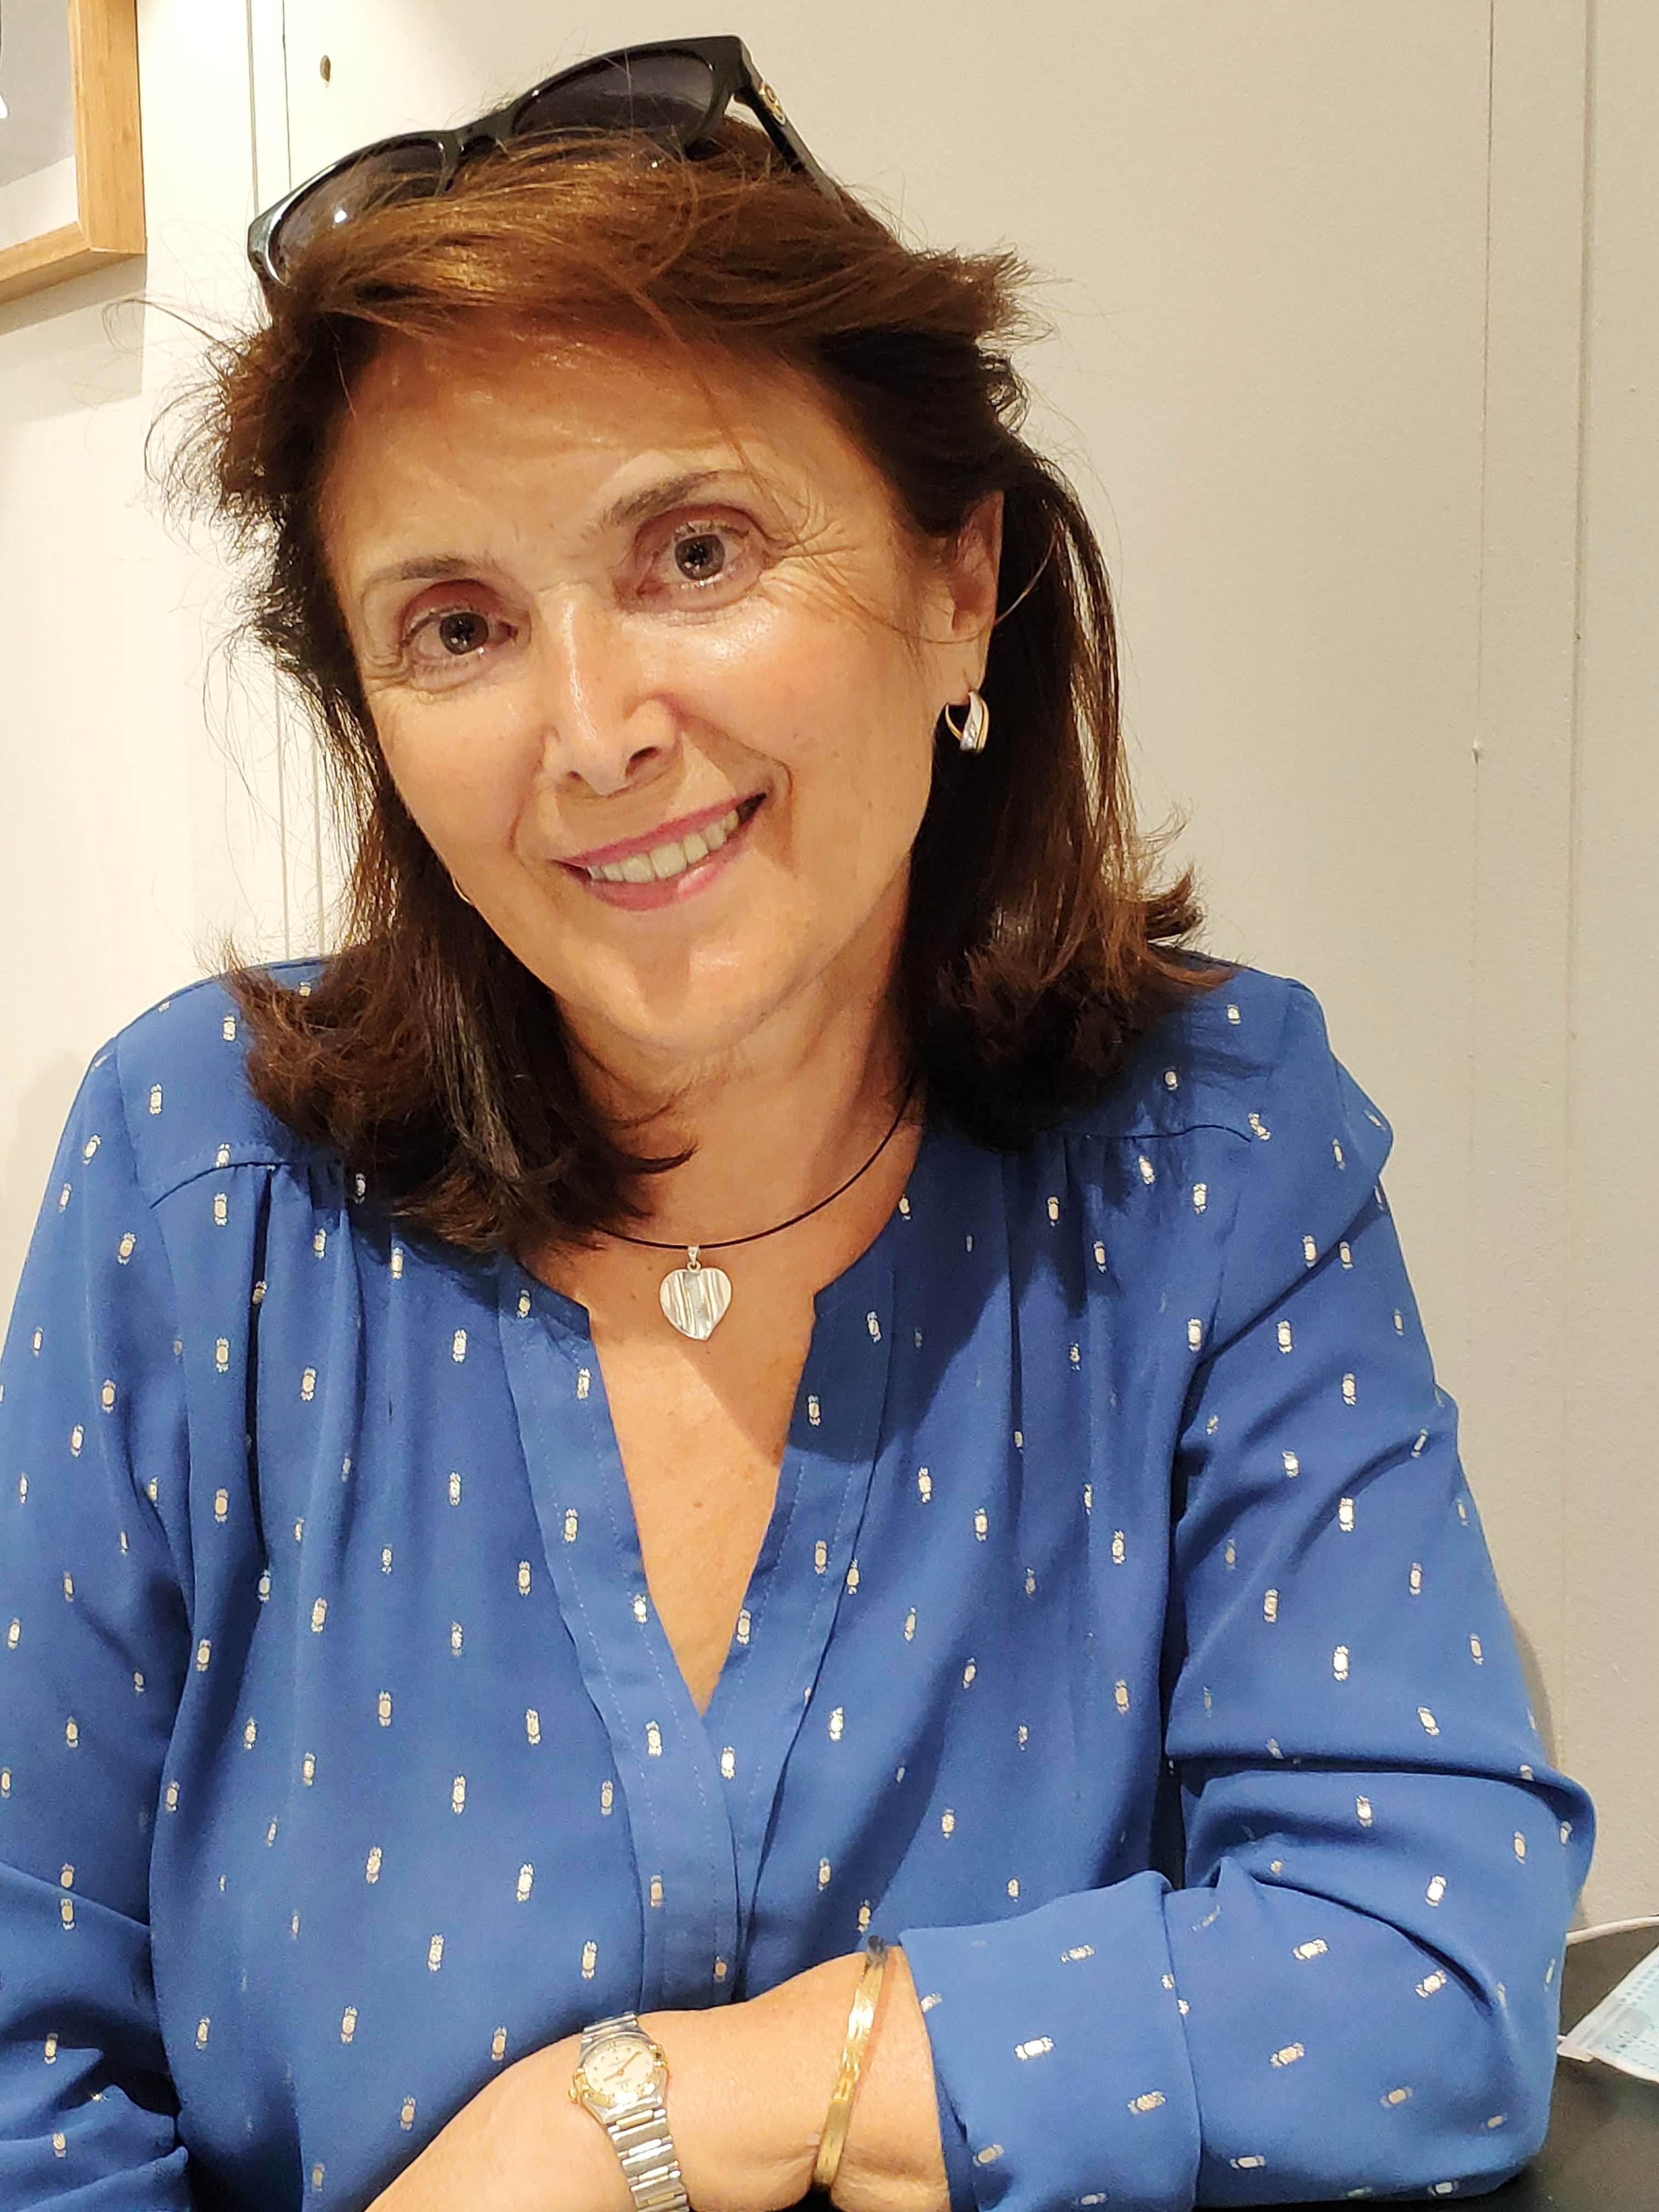 Rita Wajs